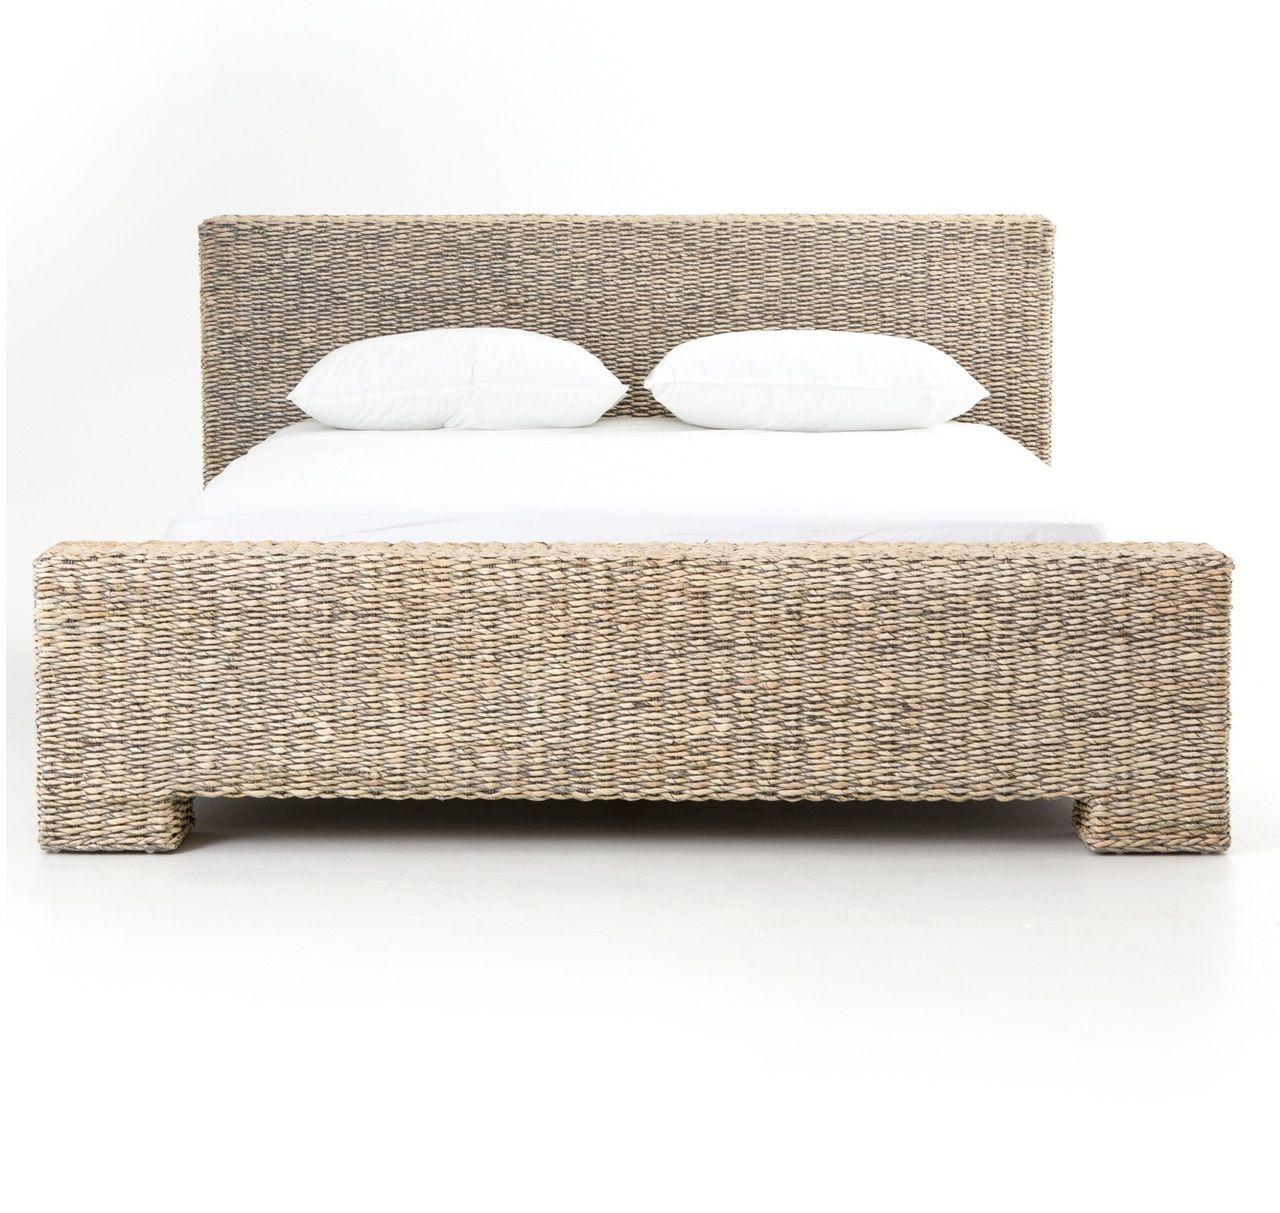 Https Www Zinhome Com Bali Woven Rattan King Platform Bed Gray